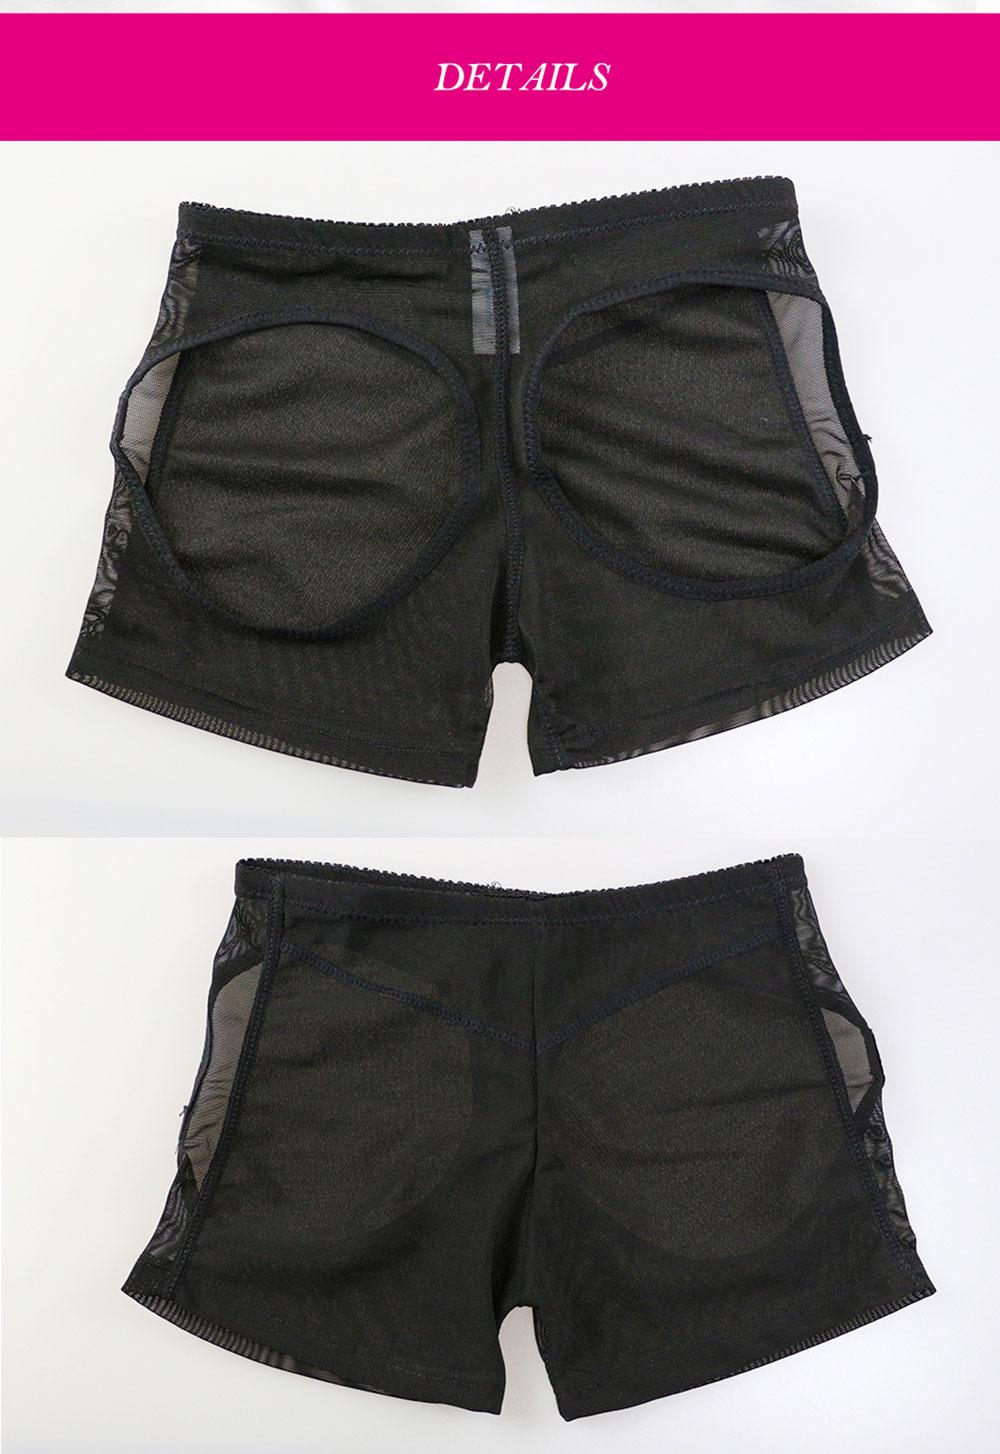 NB4001-2 Atbuty Sexy Butt Lifter Shaper Push Up Hips Enhancer Breathable Mesh Control Panty Butt Lift  Body Shaperwears (12)